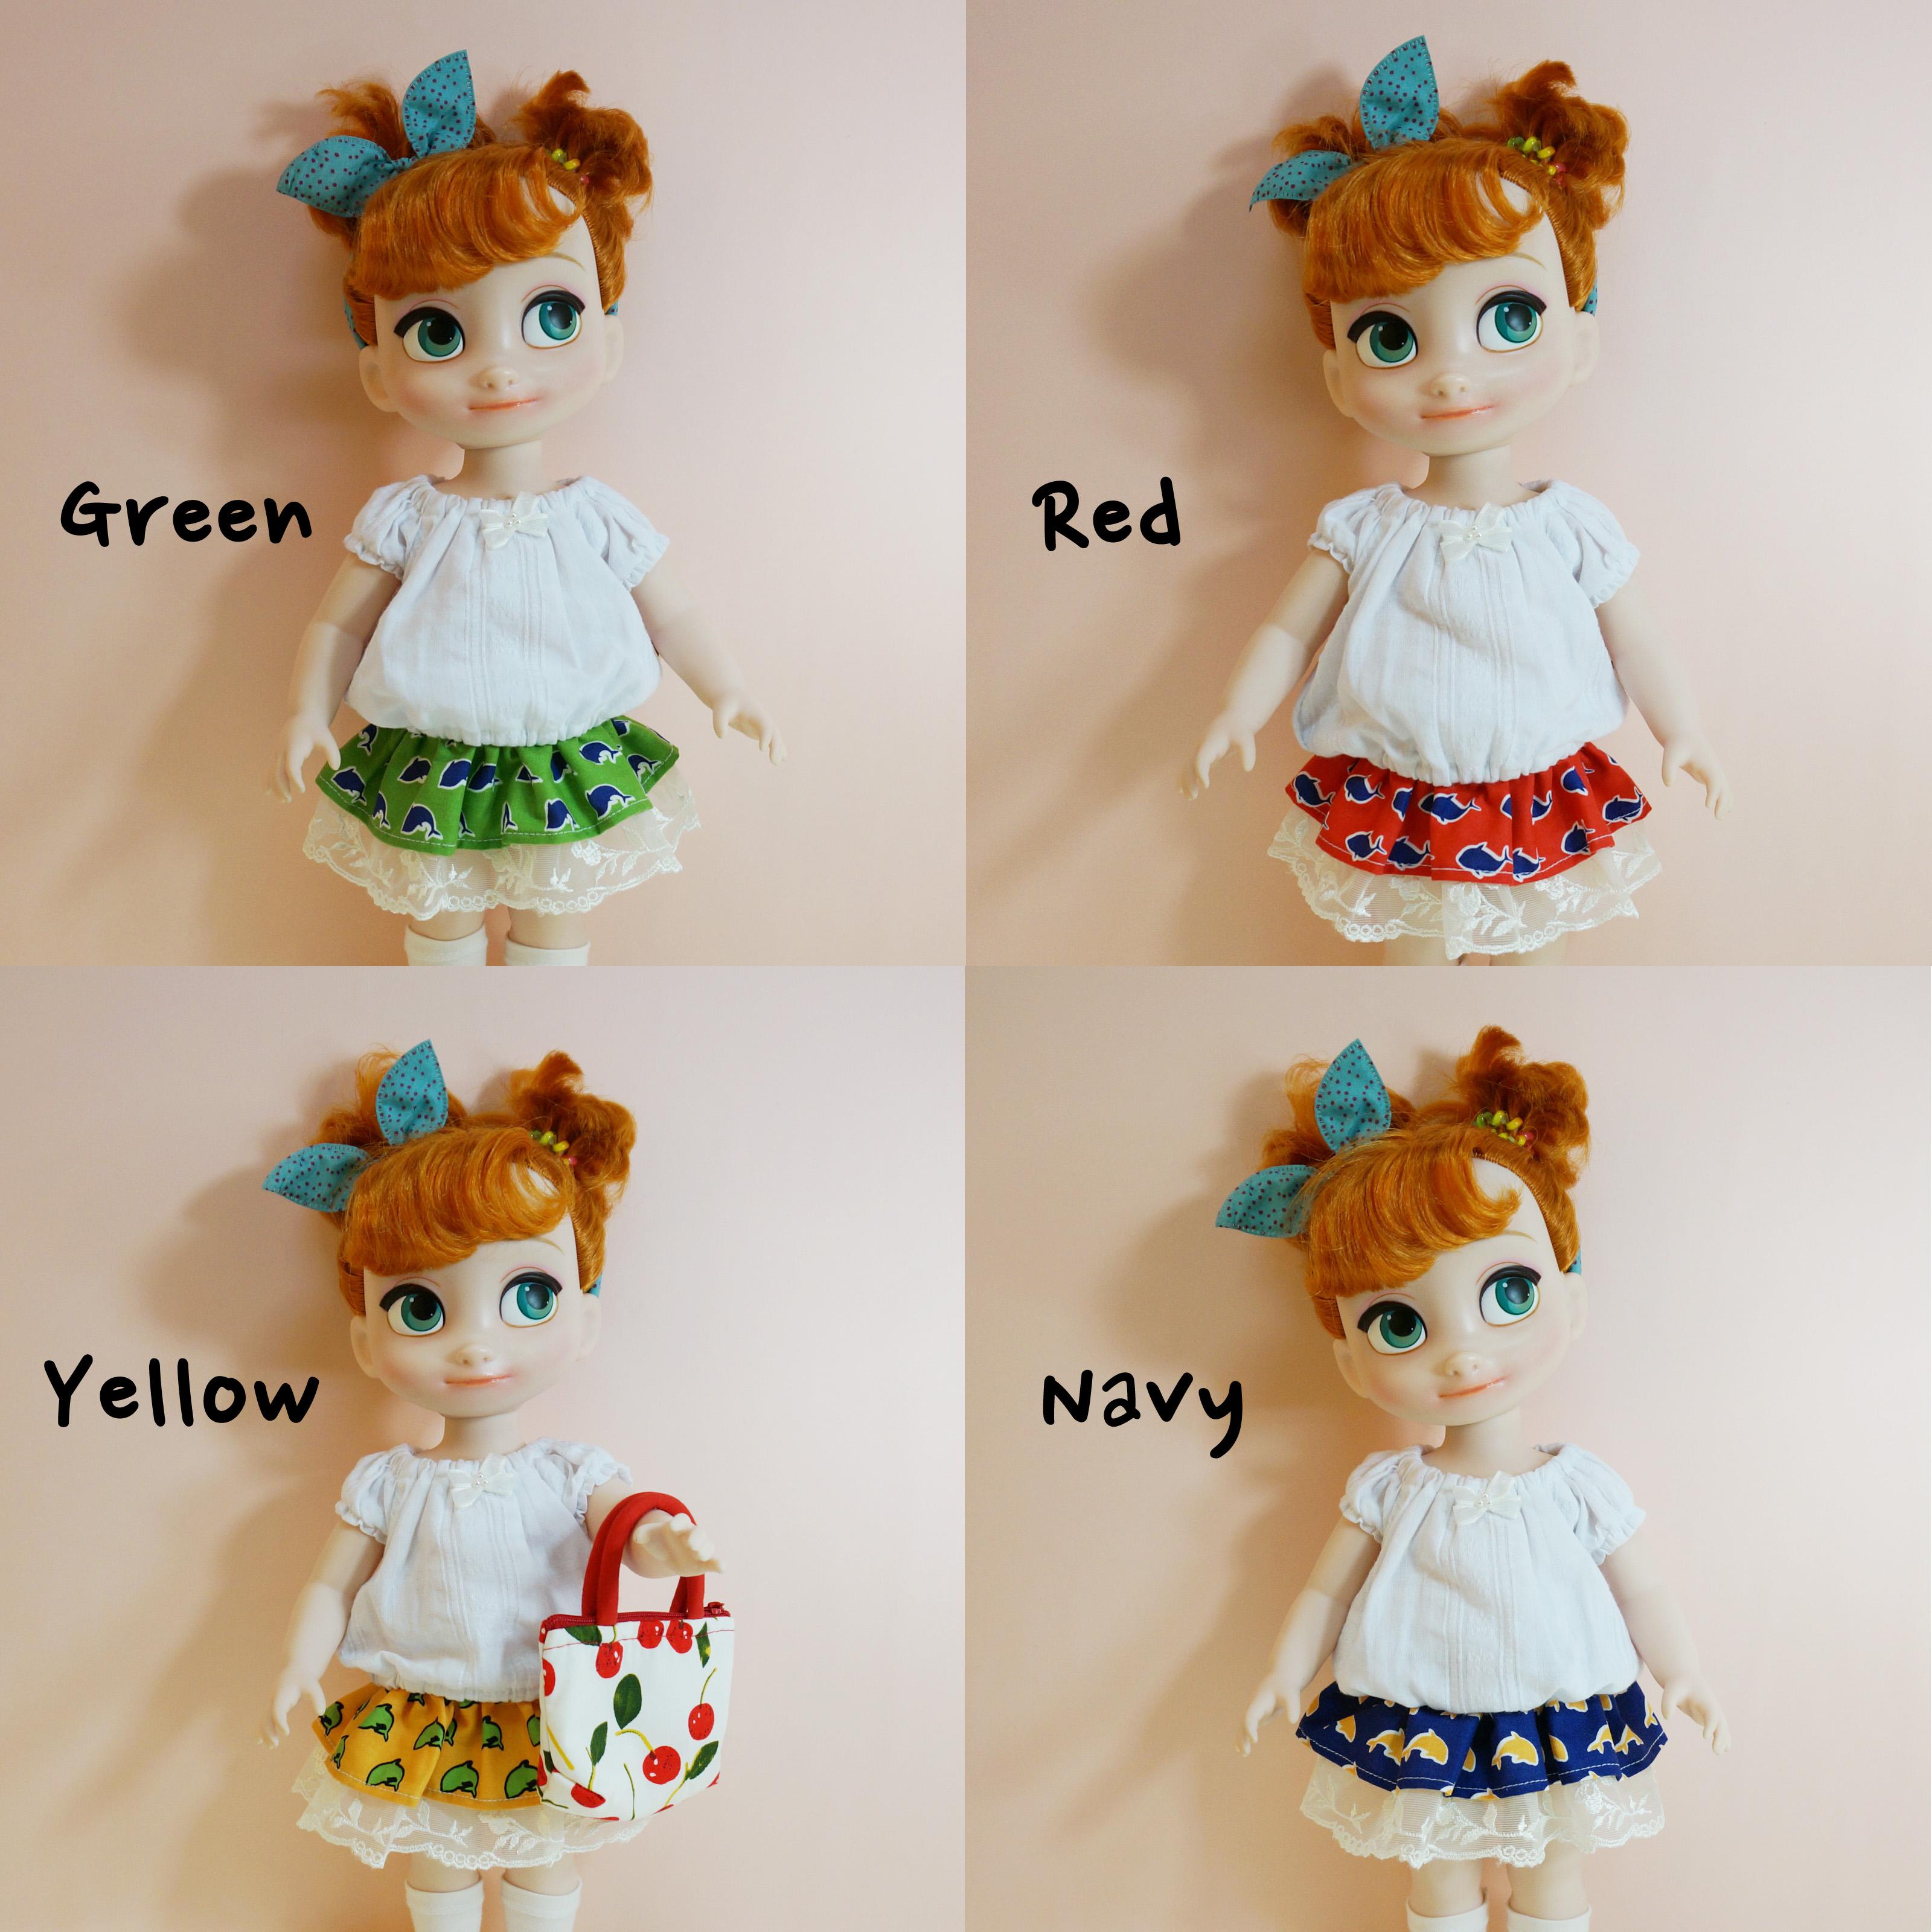 Disney Princess Doll Clothes: Disney Baby Doll Clothes Dolphine Set Clothing Animator's